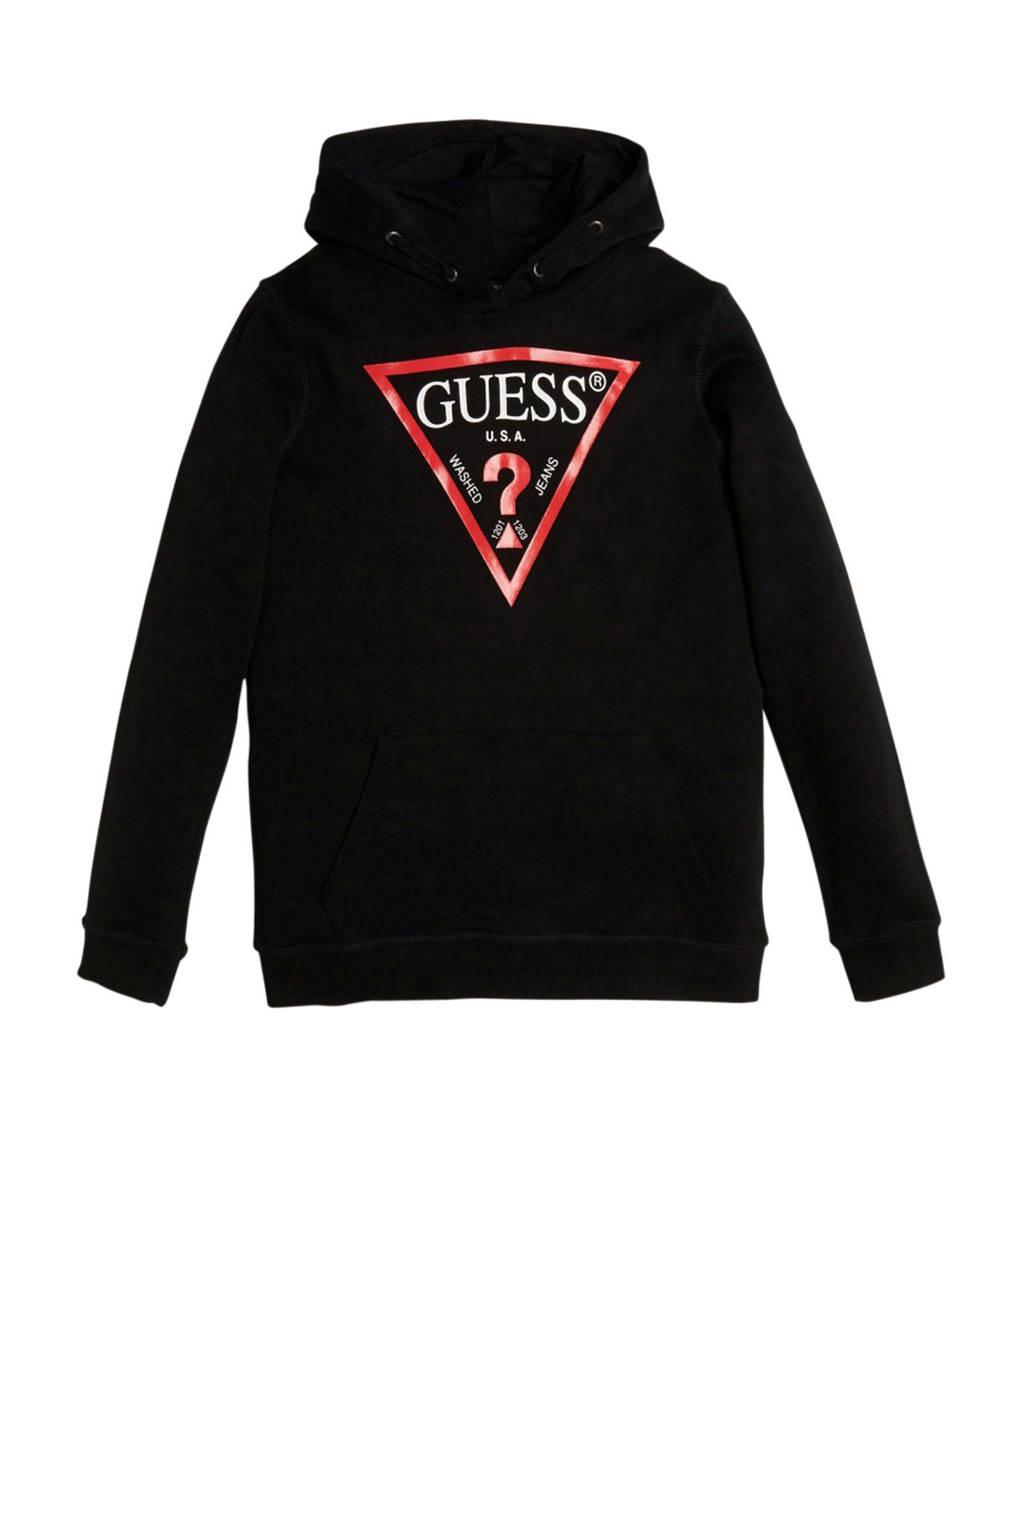 GUESS hoodie met logo zwart, Zwart